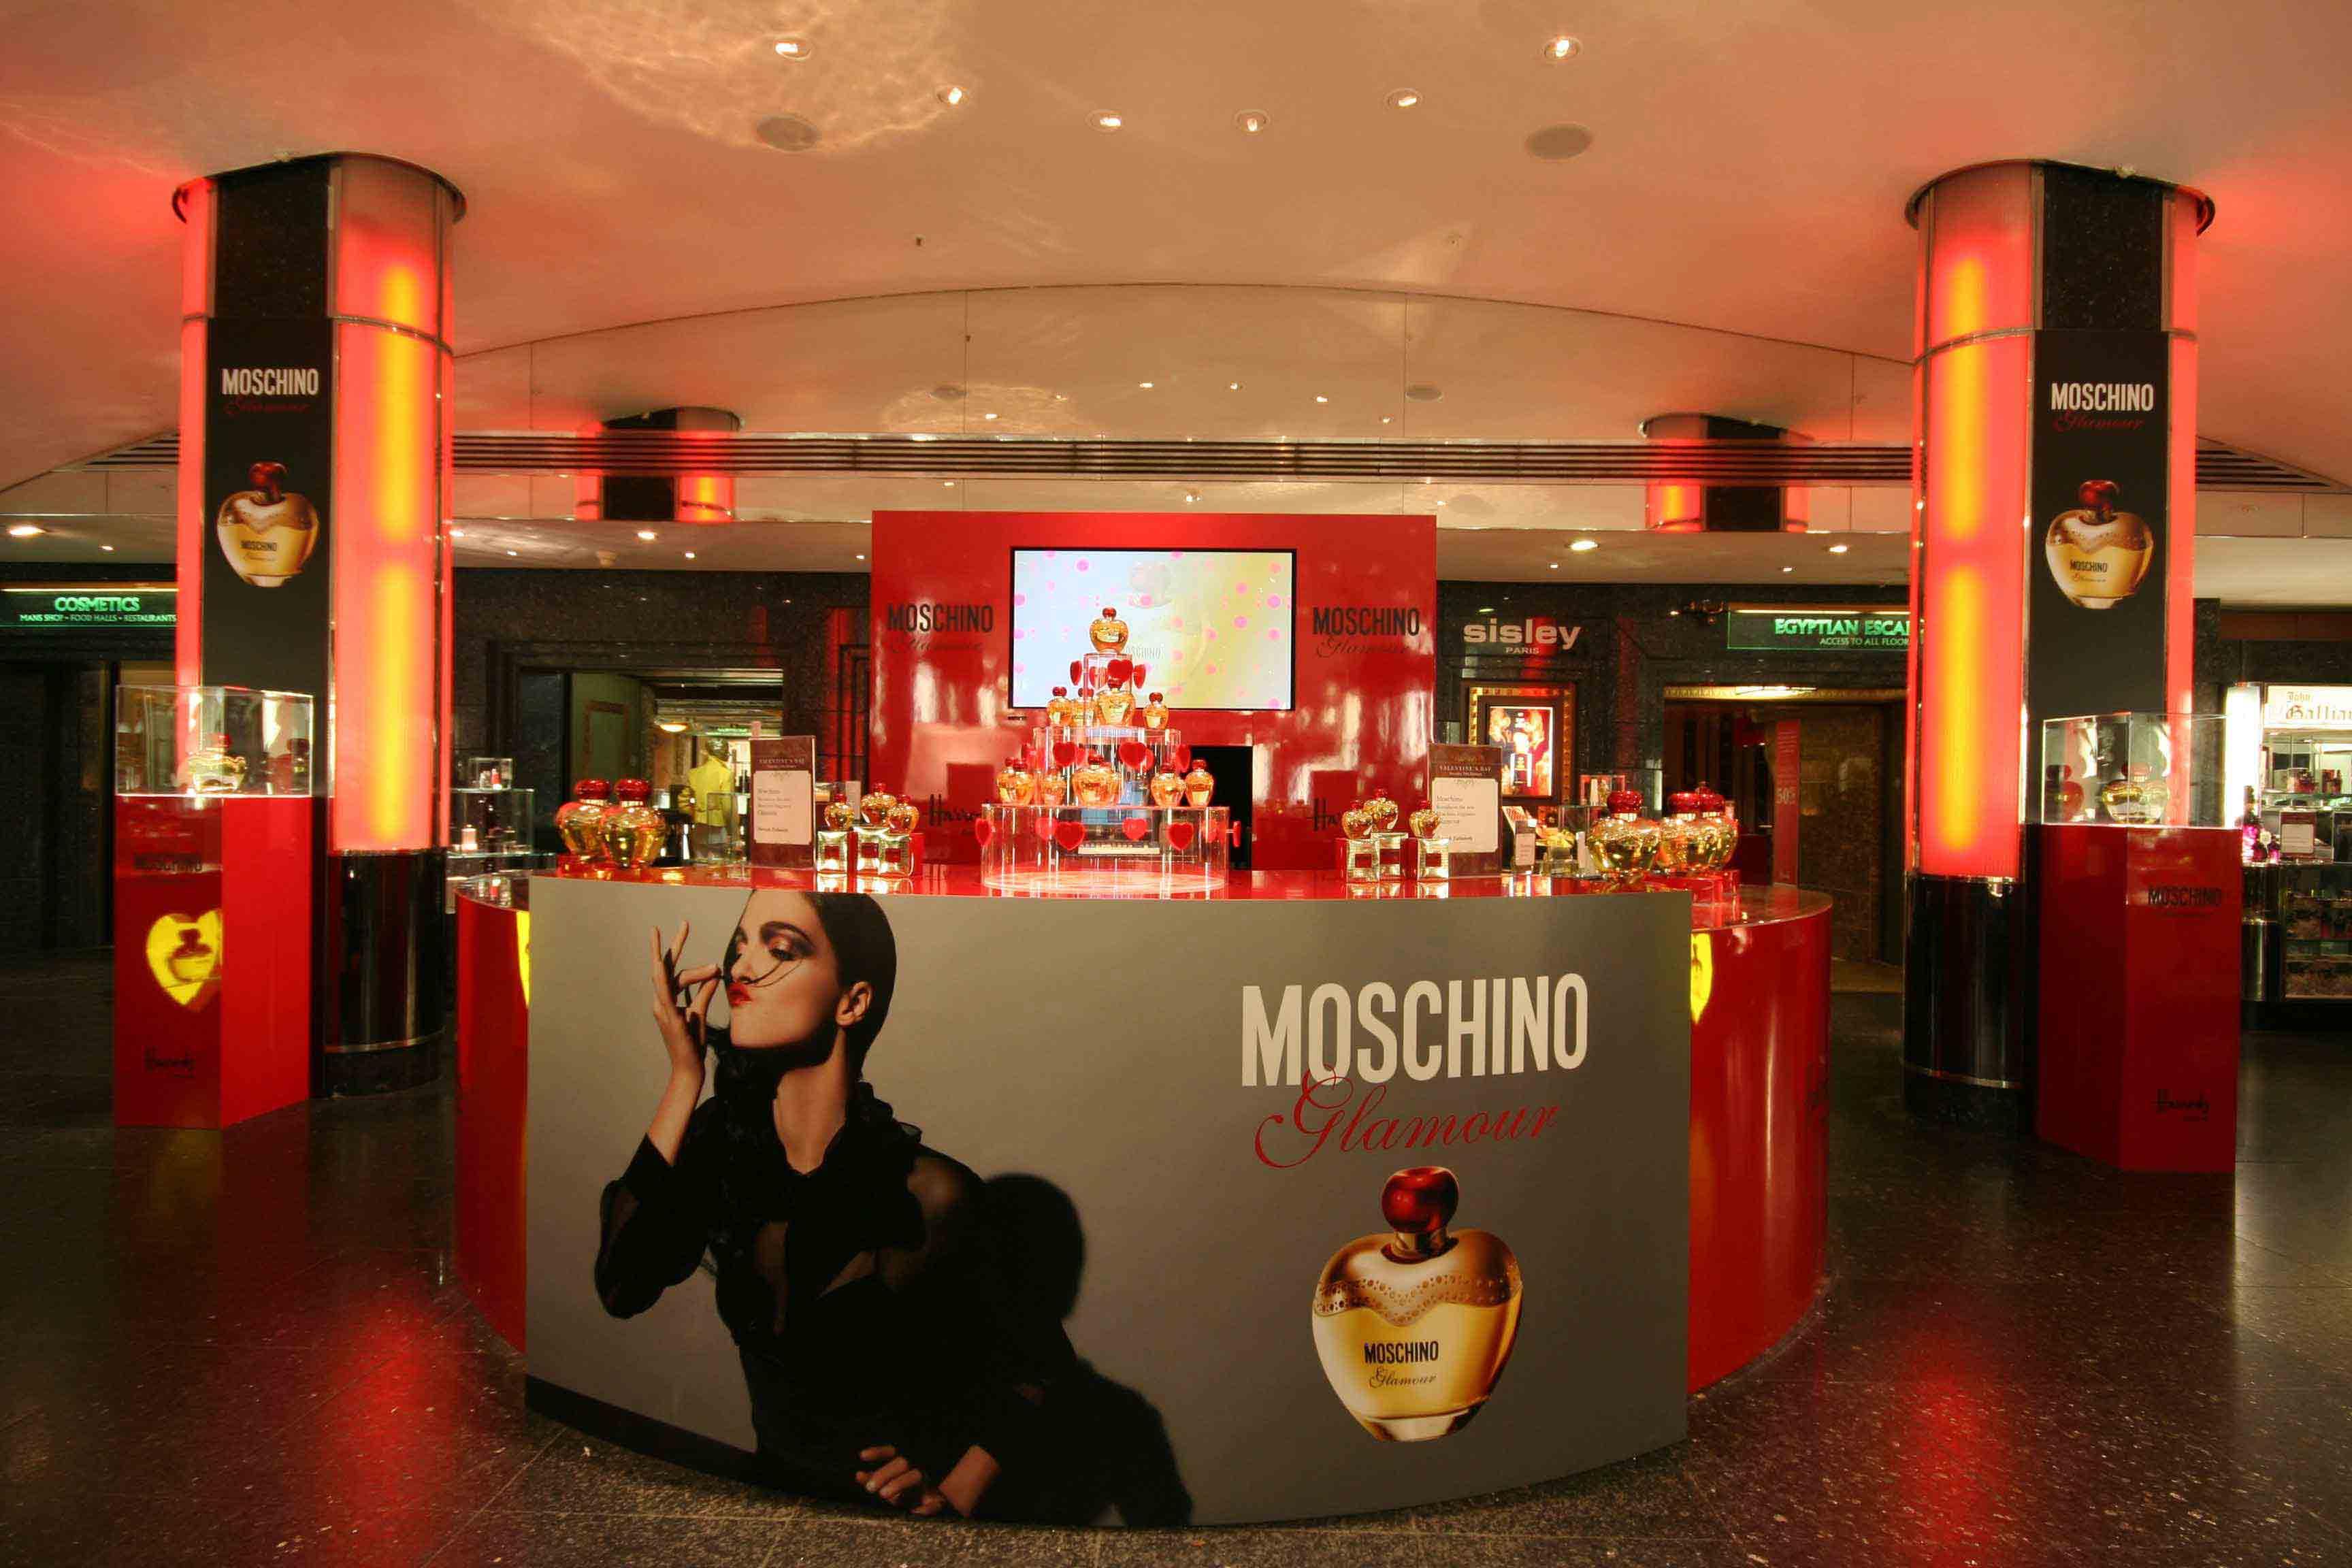 Moschino Glamour Harrods